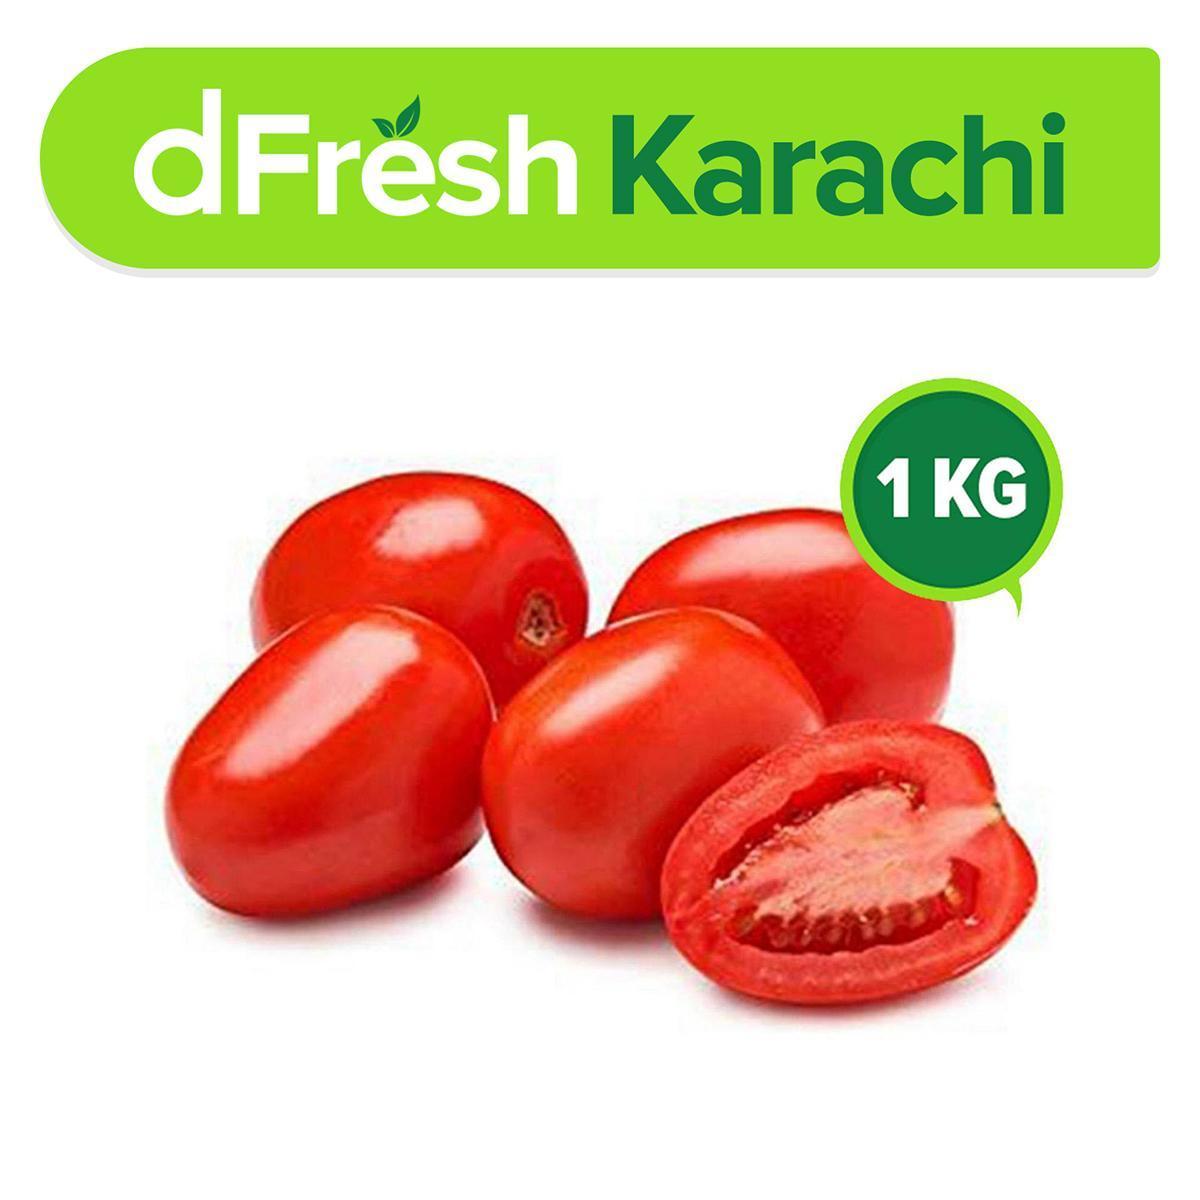 dFresh: Market Value Tomatoes (Tamatar) (1 Kg)